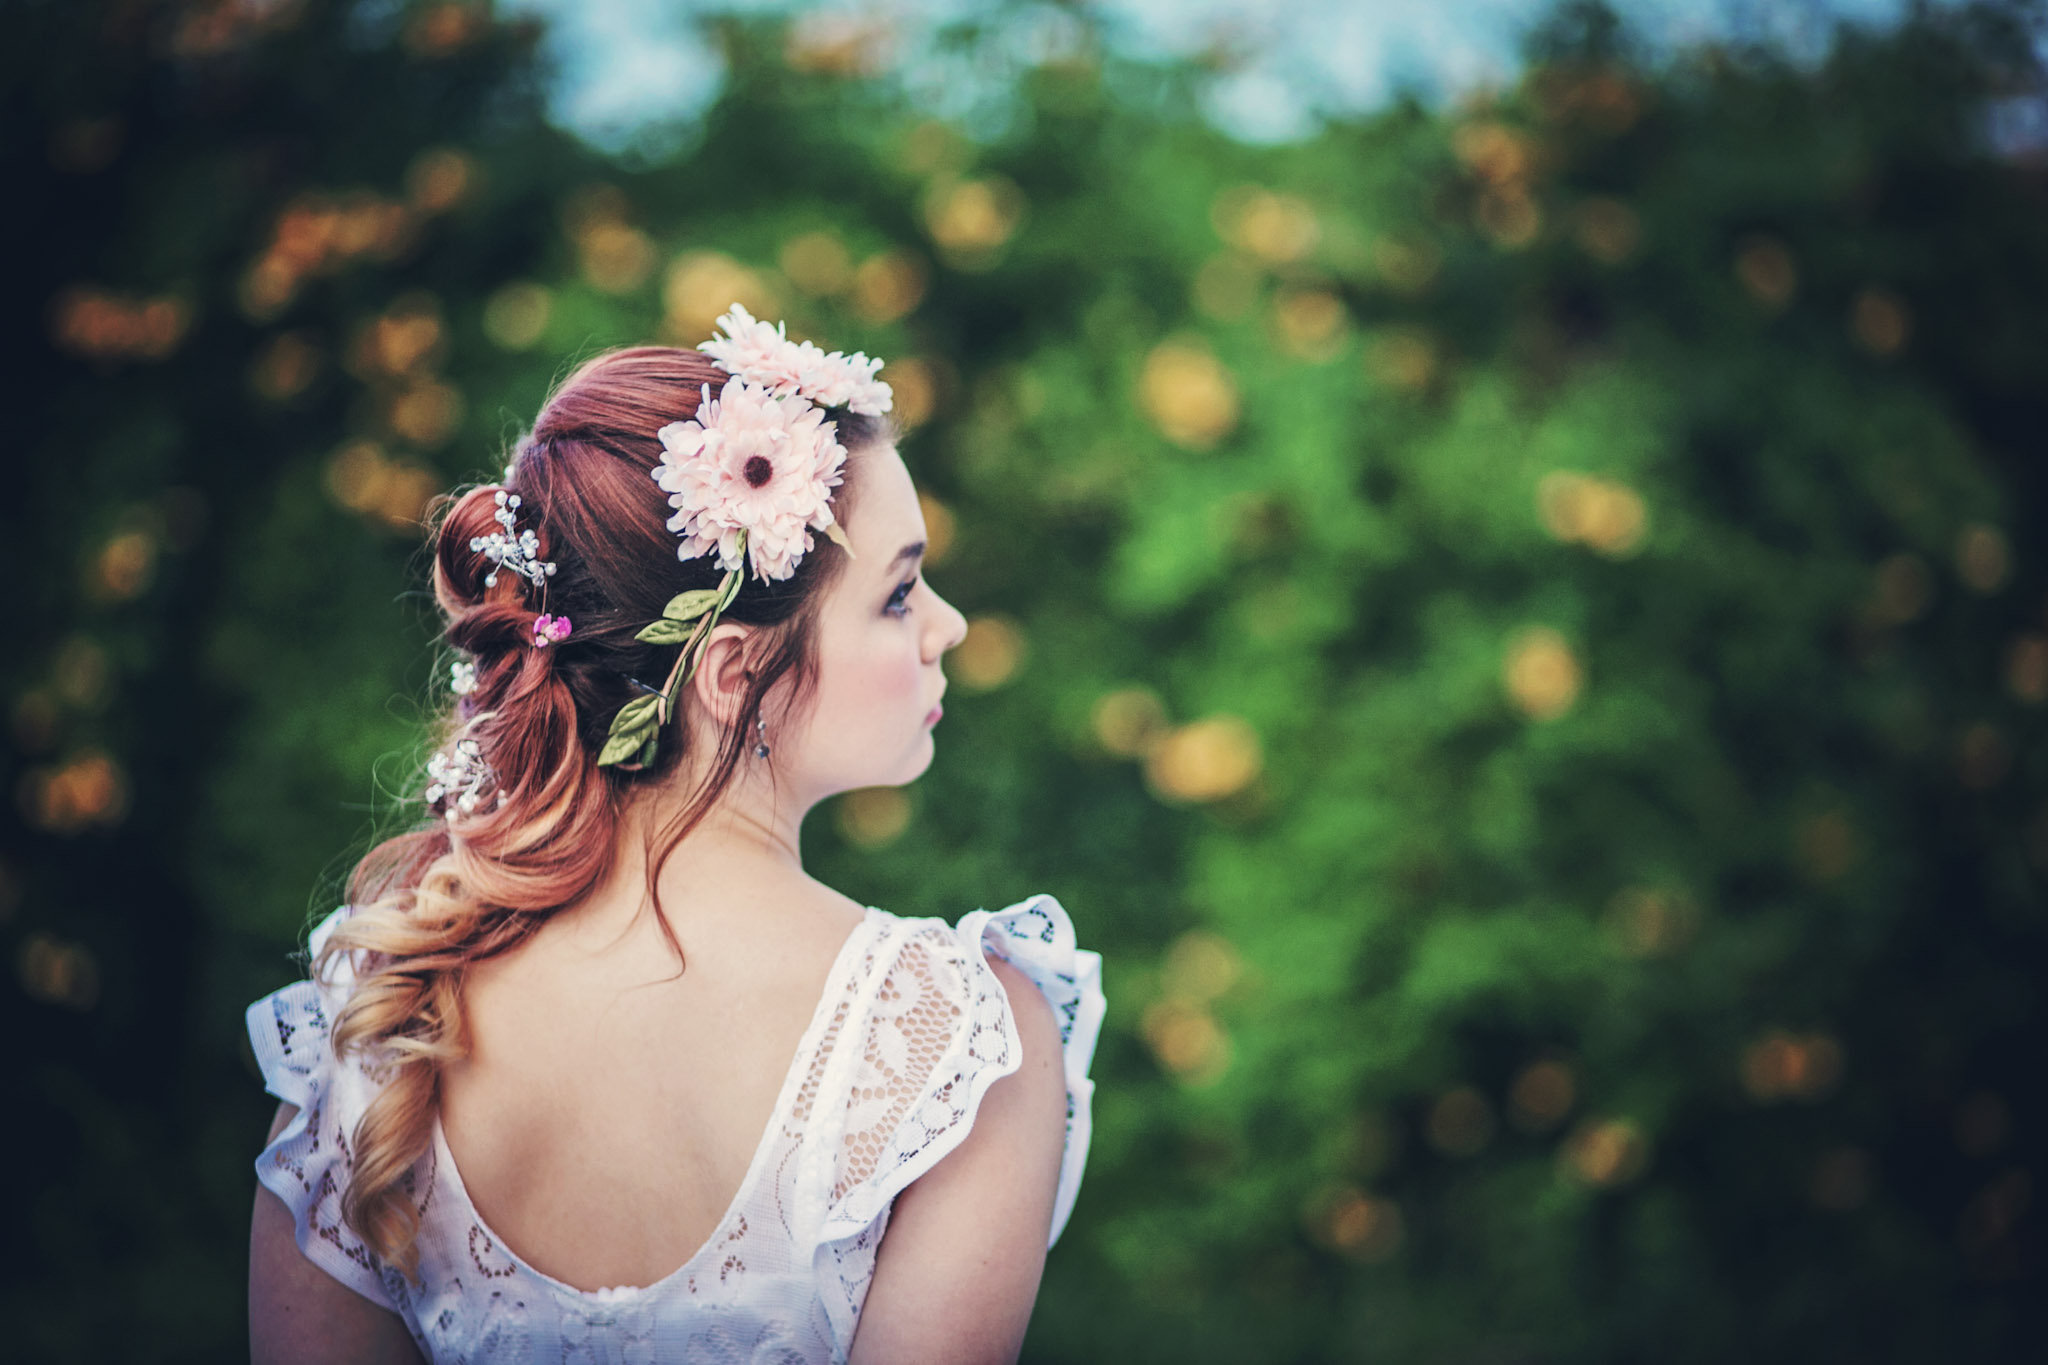 Kansas_City_Small_Wedding_Venue_Elope_Intimate_Ceremony_Budget_Affordable_Sophie&Philip_258b.jpg